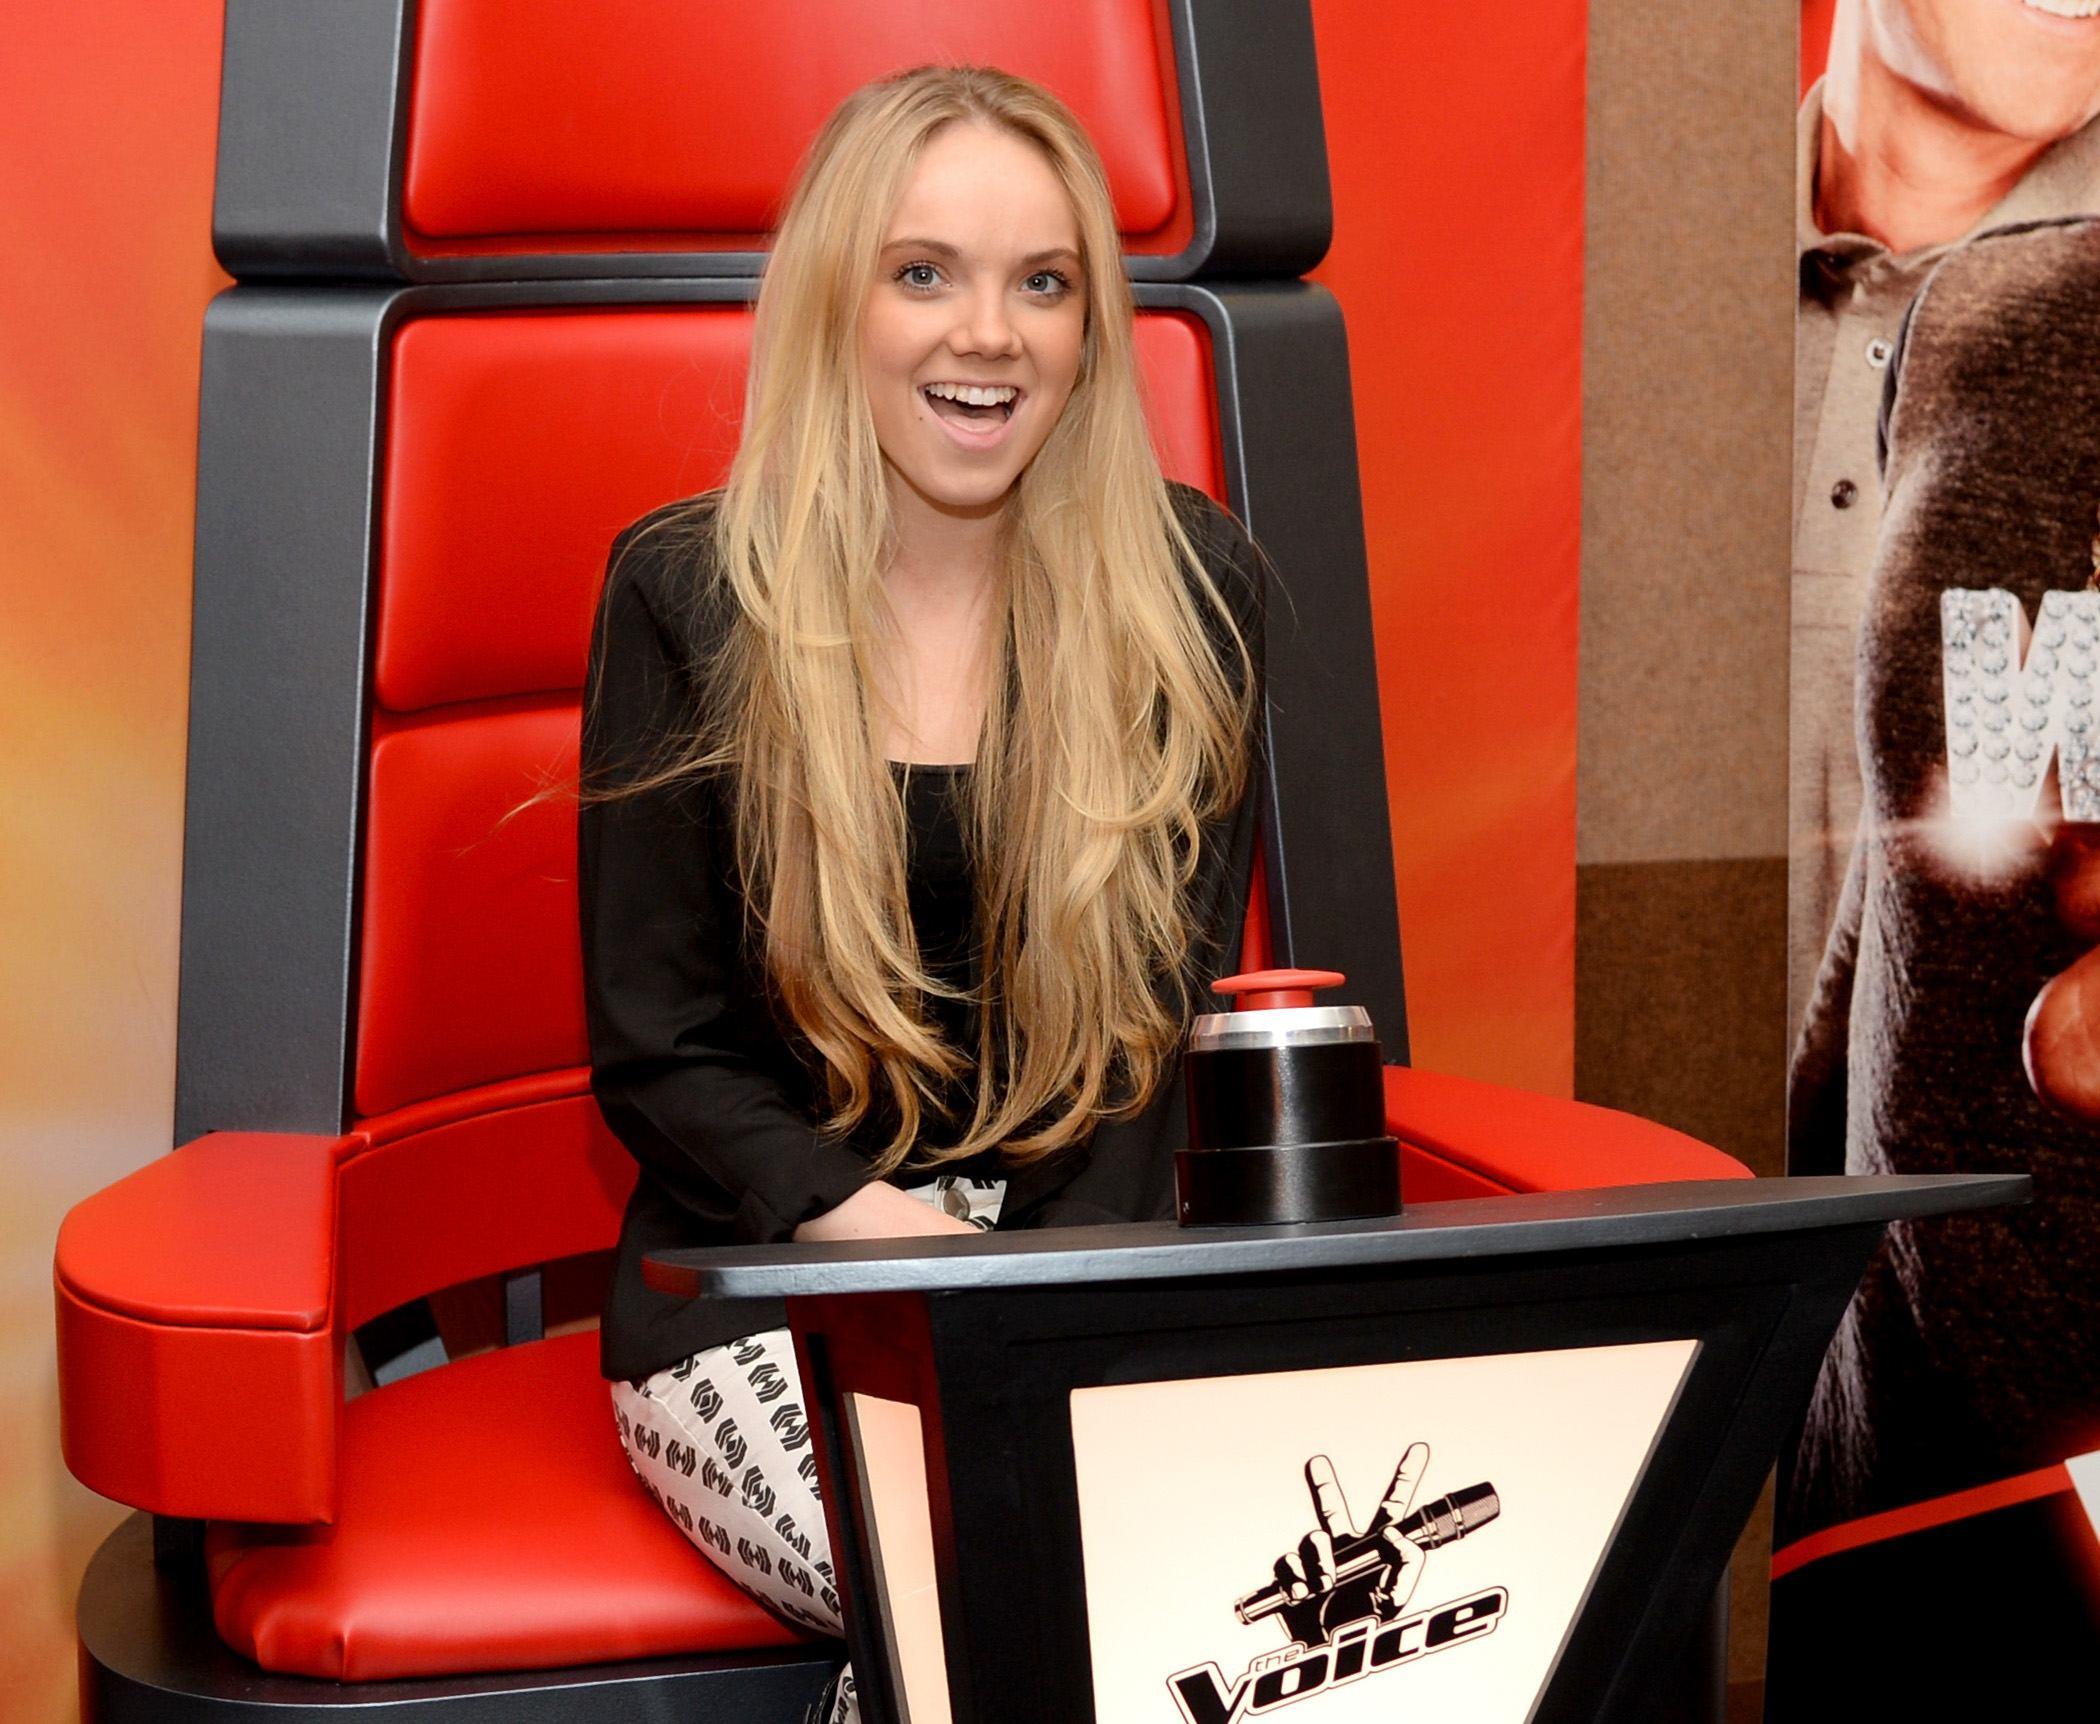 Danielle Bradbery in the voice chair